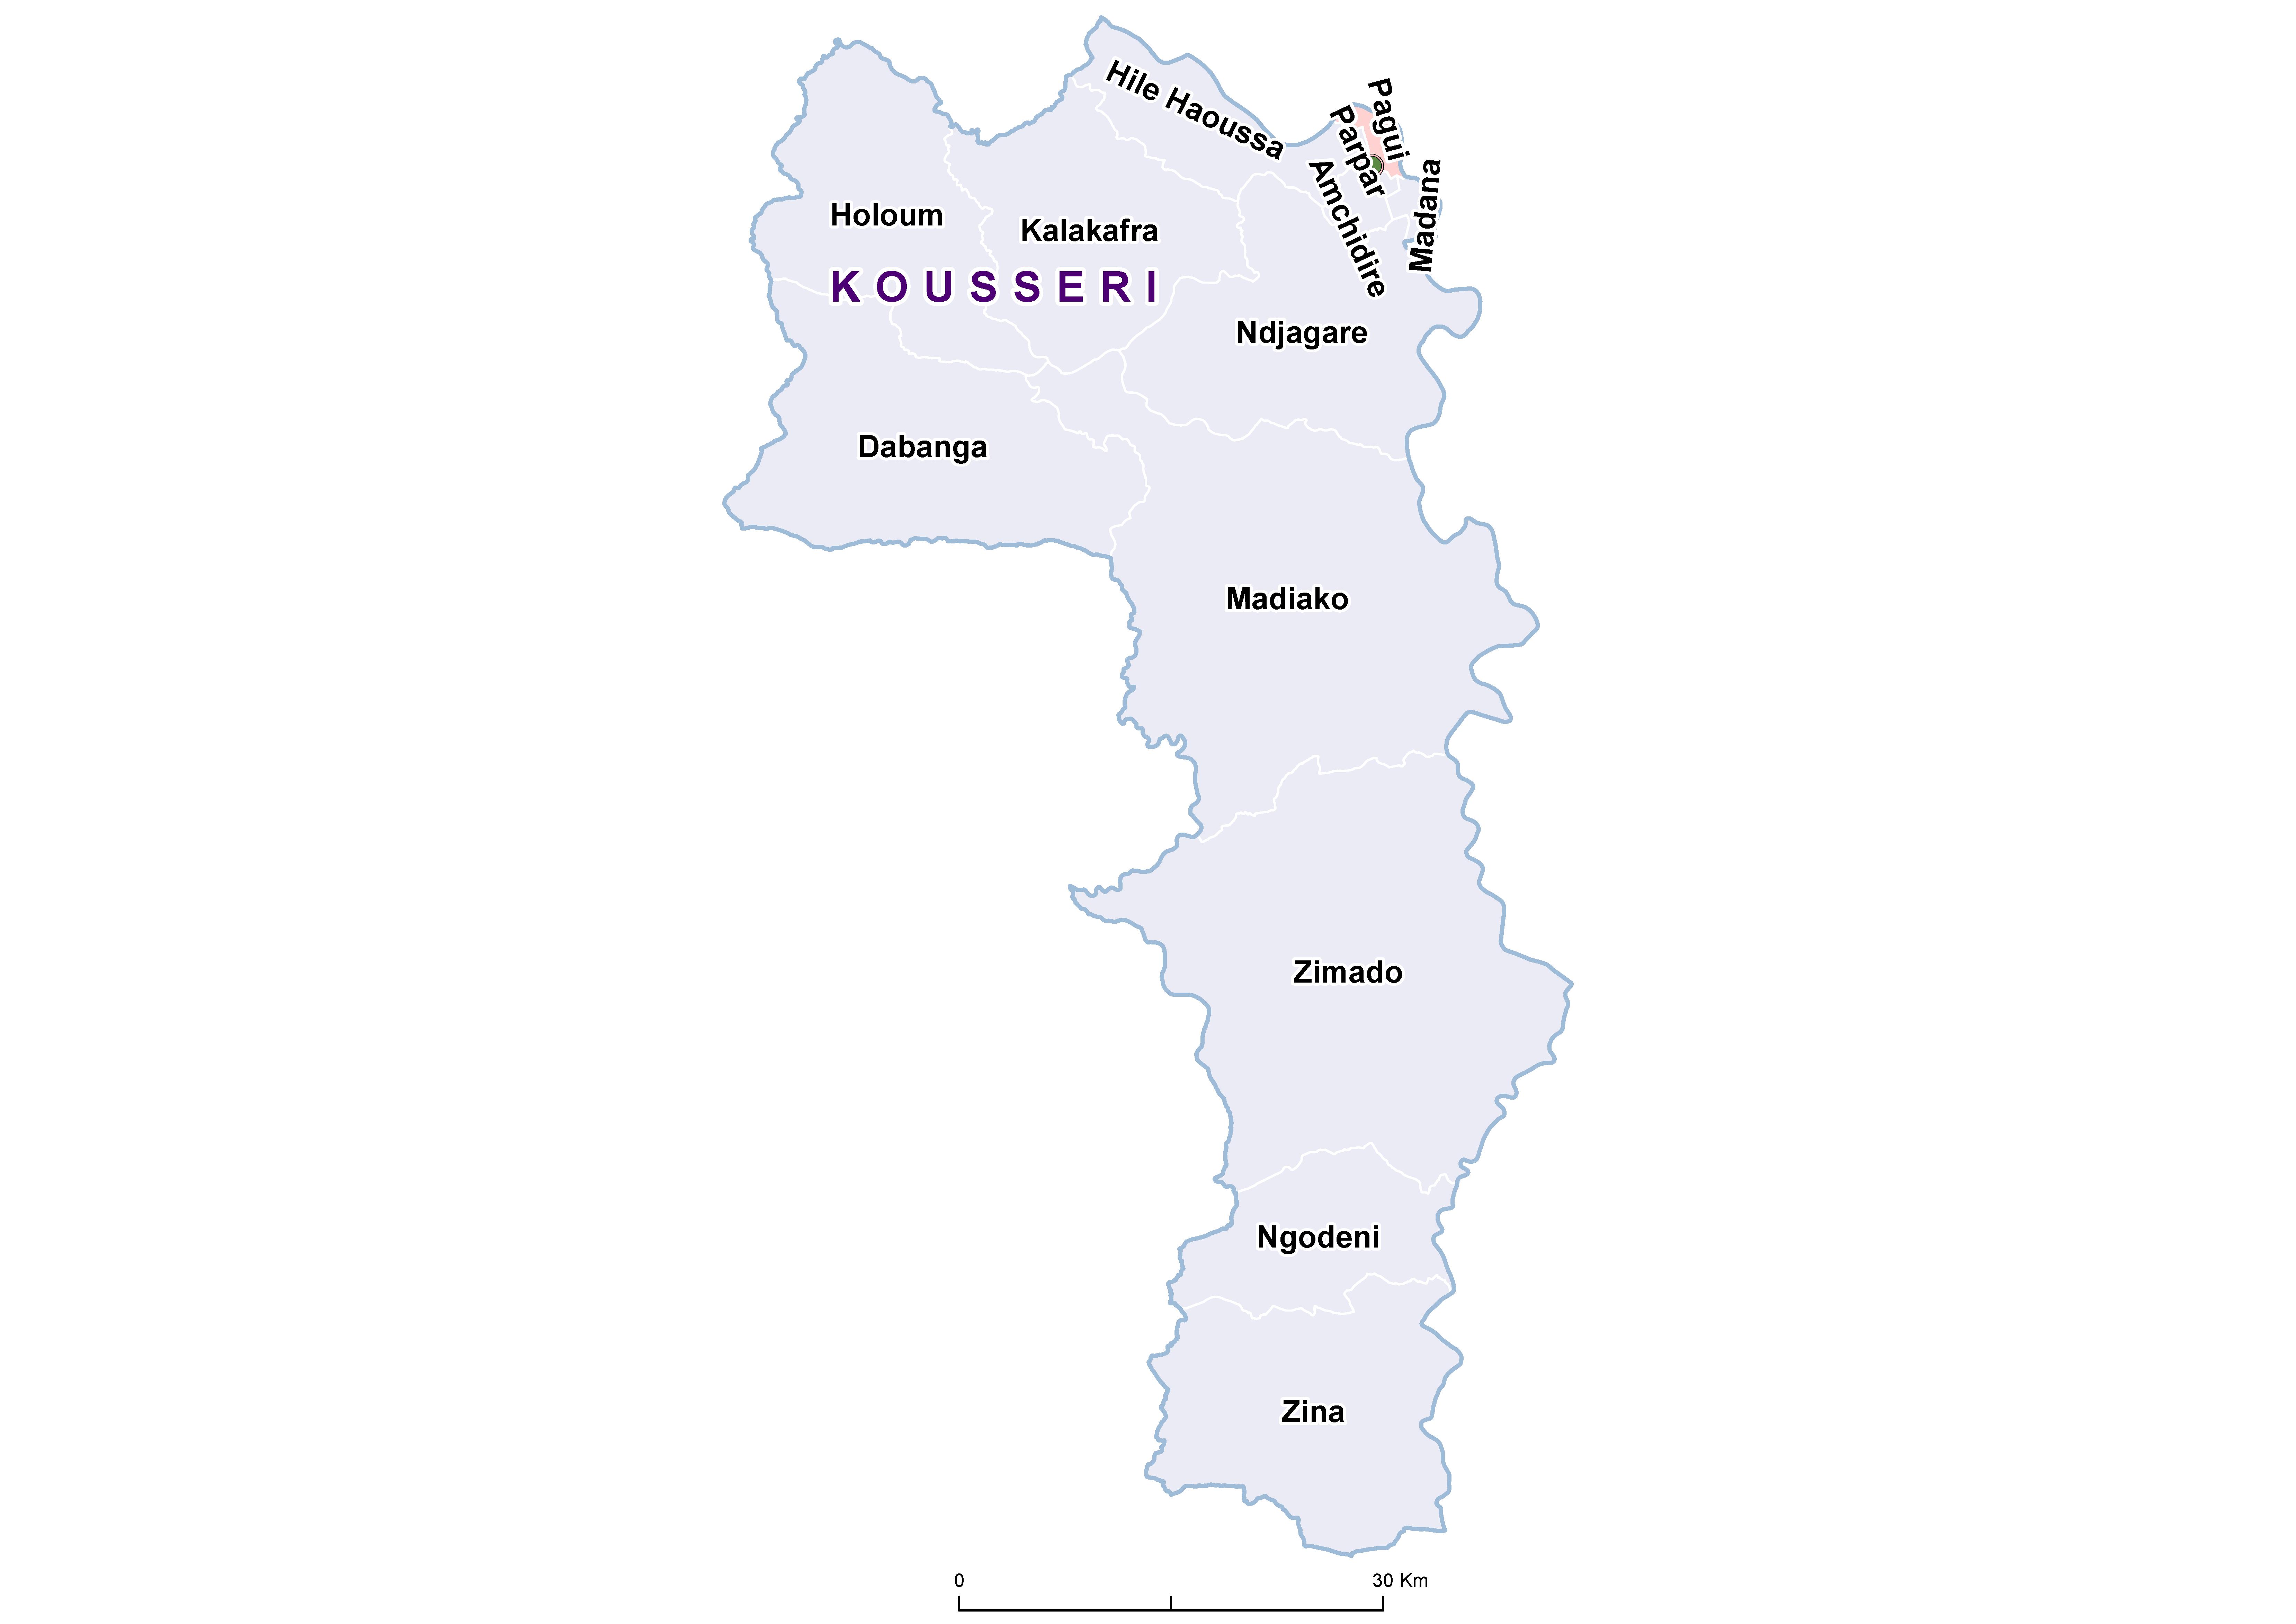 Kousseri STH 19850001